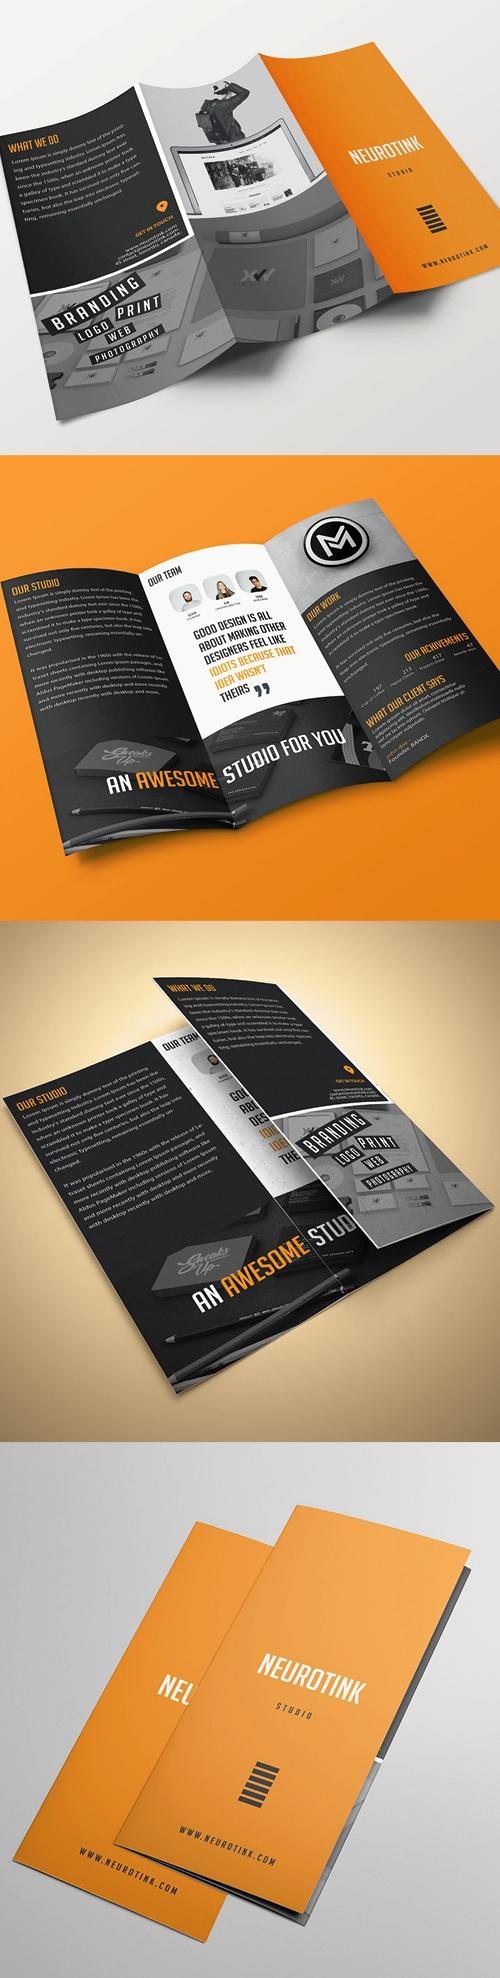 Company Profile Bisnis Perusahaan Identity Brochure